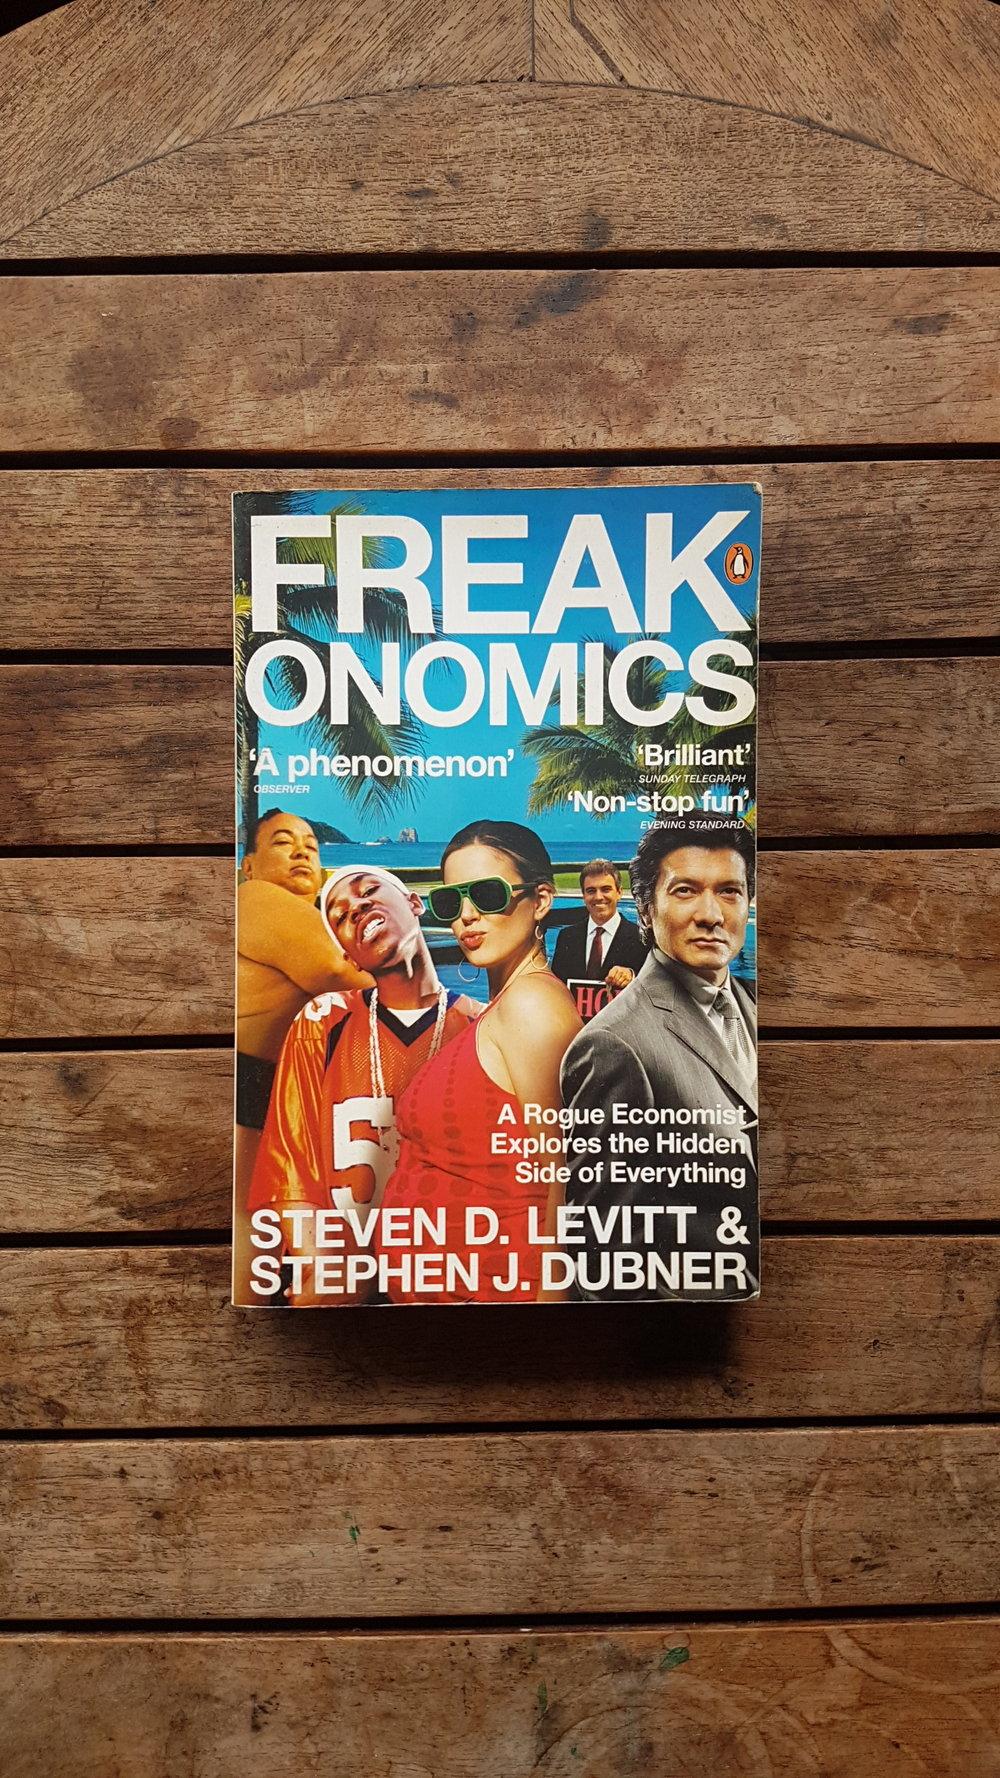 Freakonomics: A Rogue Economist Explores the Hidden Side of Everything   by Steven D. Levitt